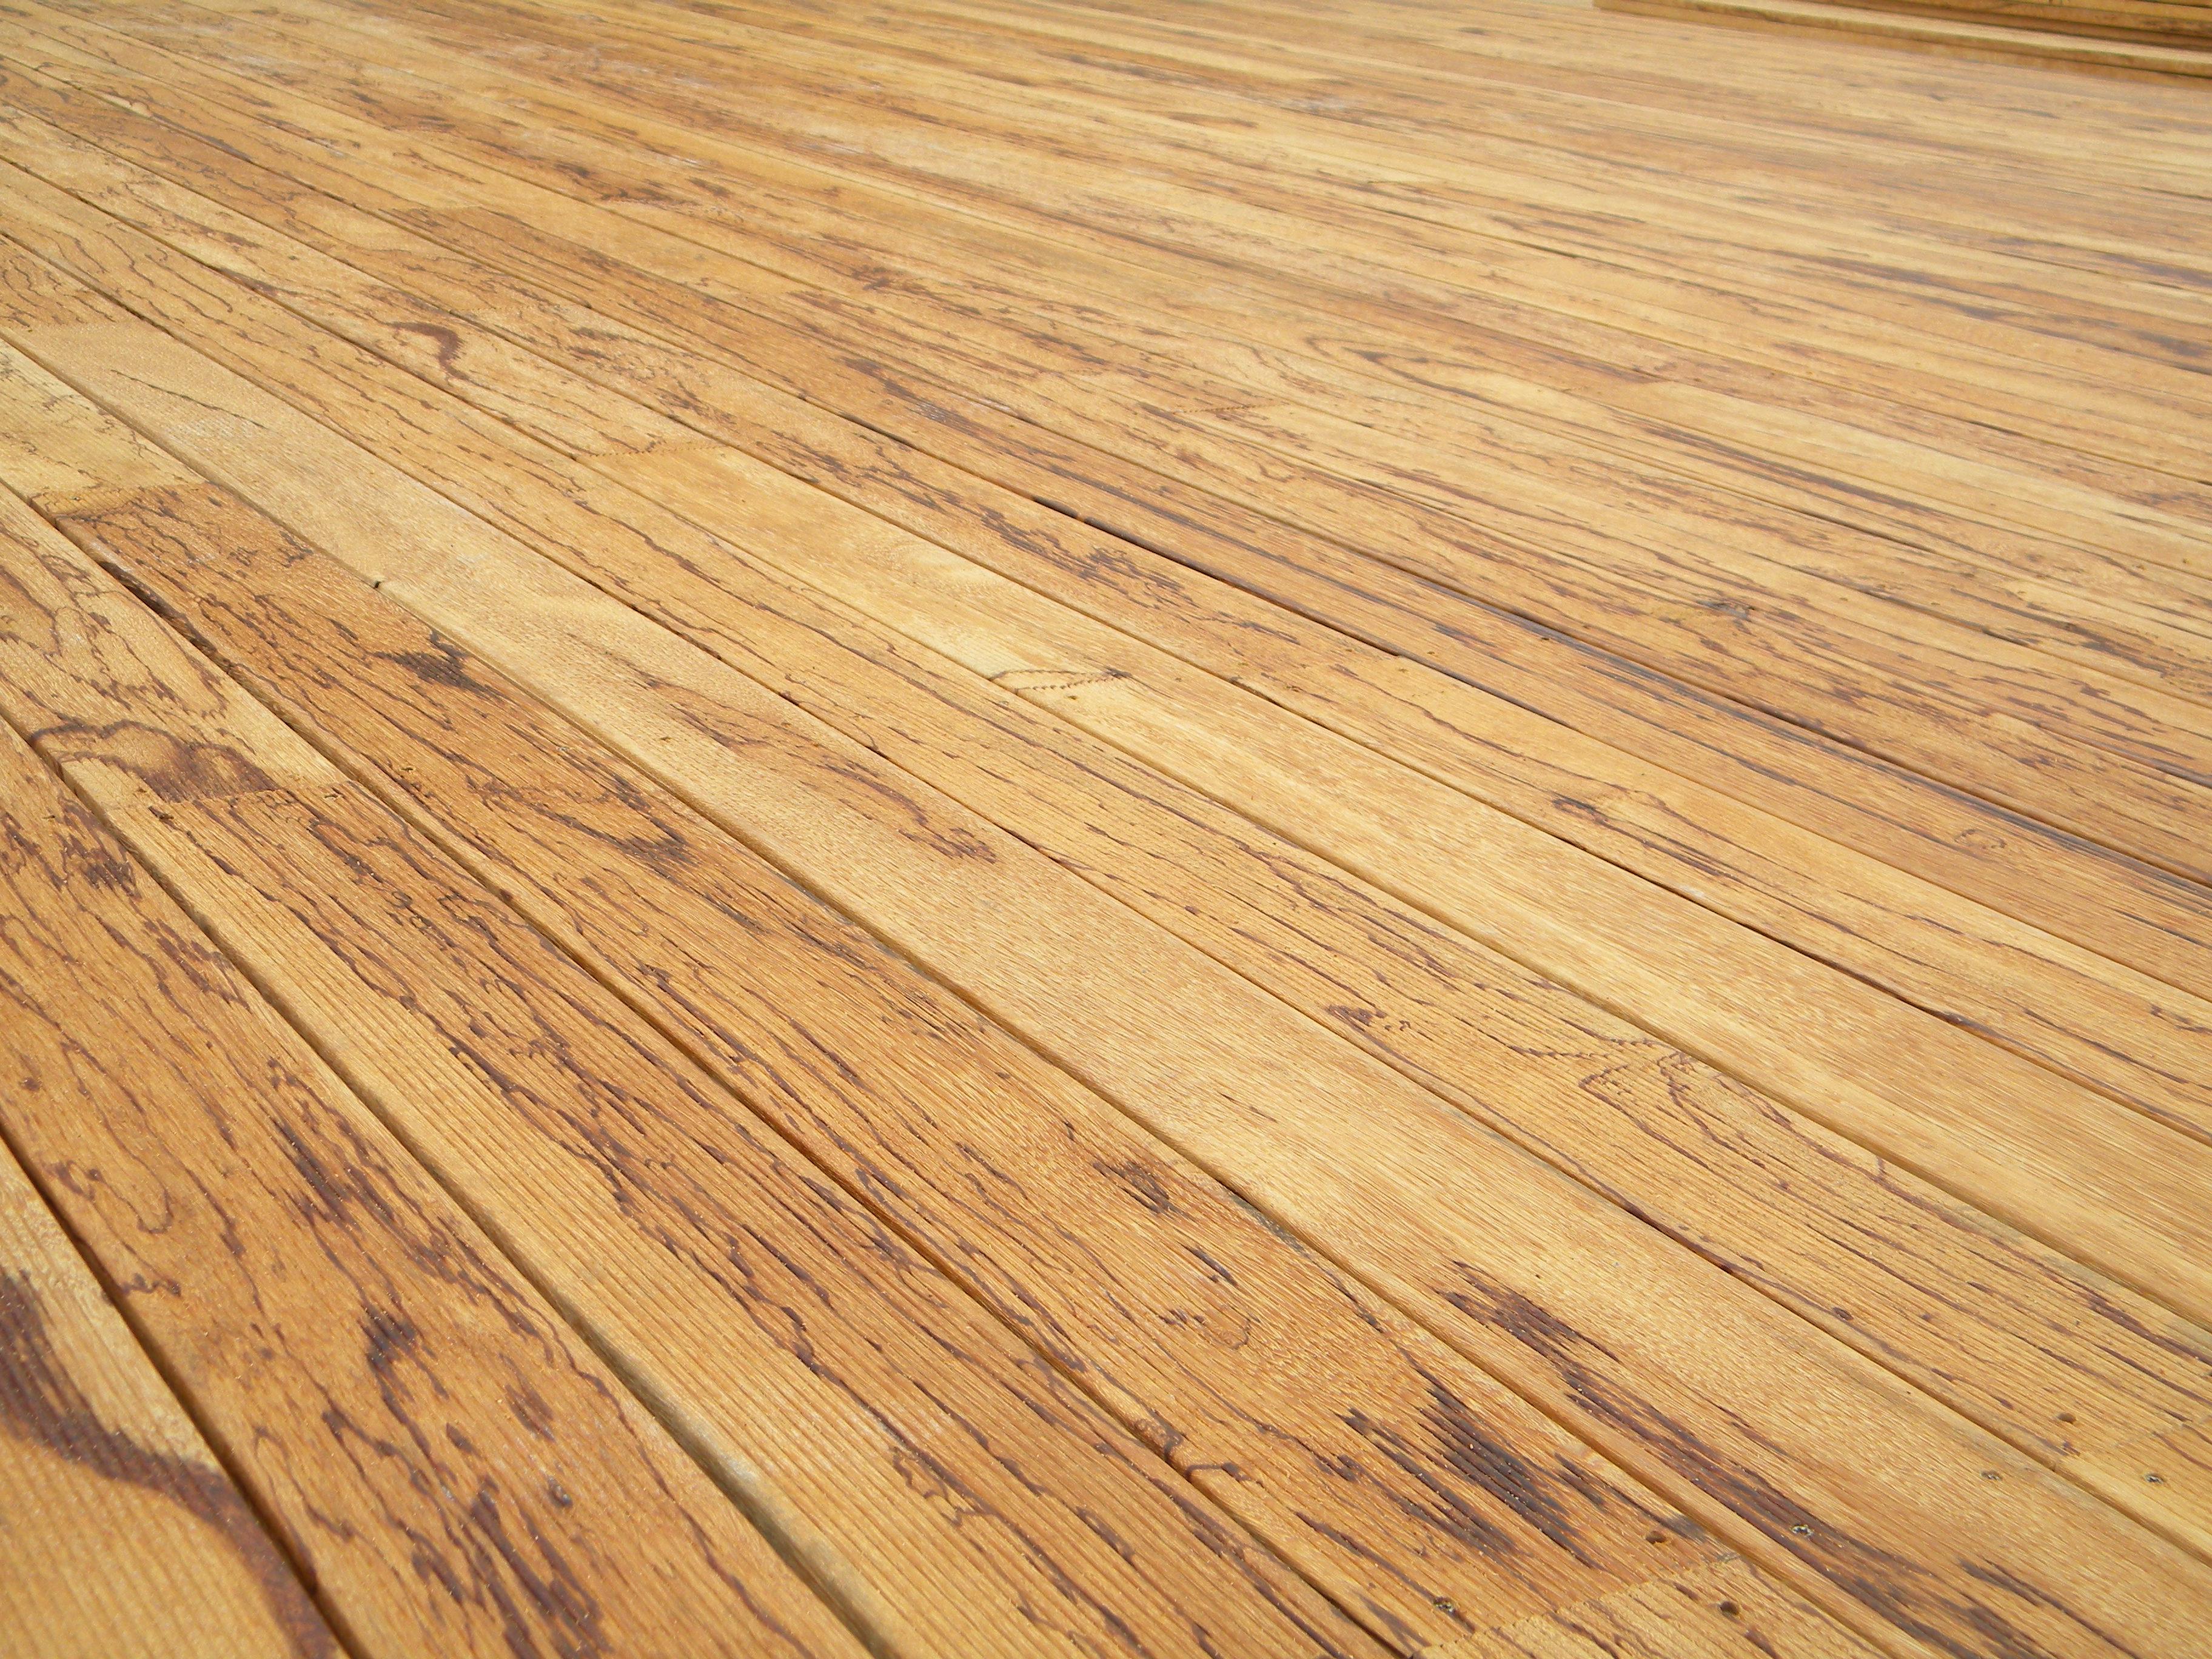 Deck-uri lemn - Angelim Rajado SELVA FLOORS - Poza 54